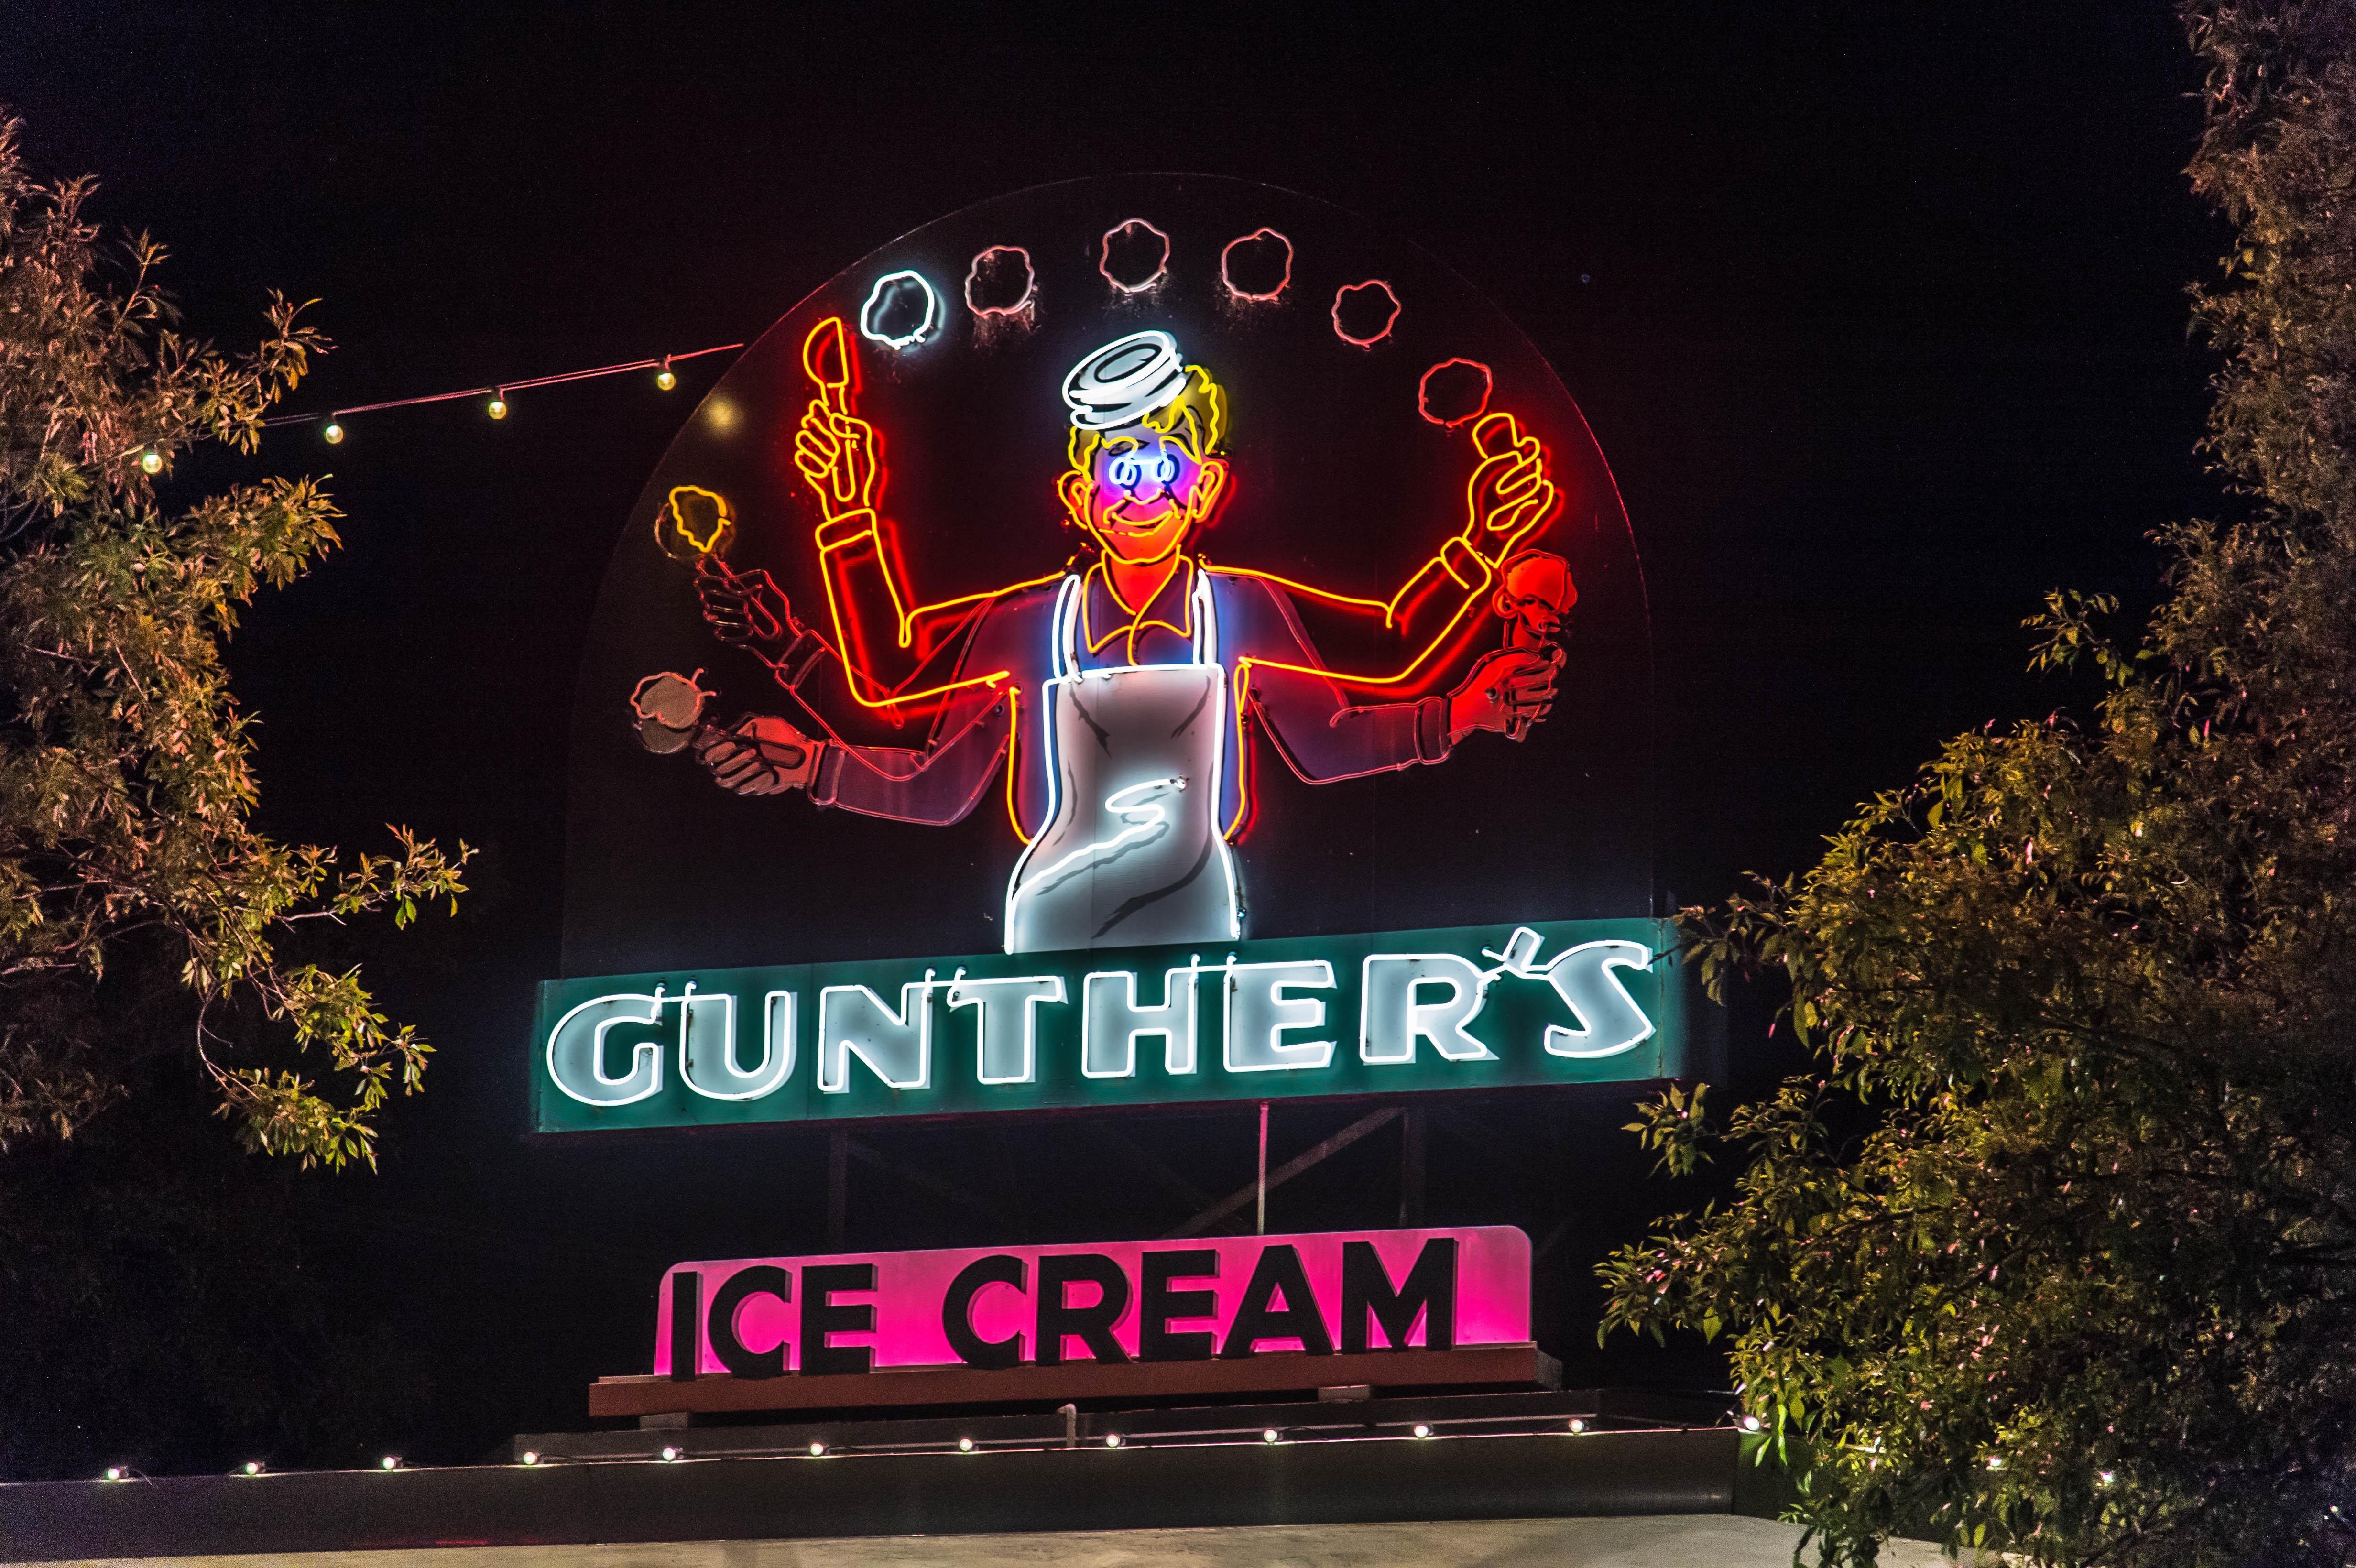 Gunther's Ice Cream - 2801 Franklin Boulevard, Sacramento, California U.S.A. - May 2, 2014